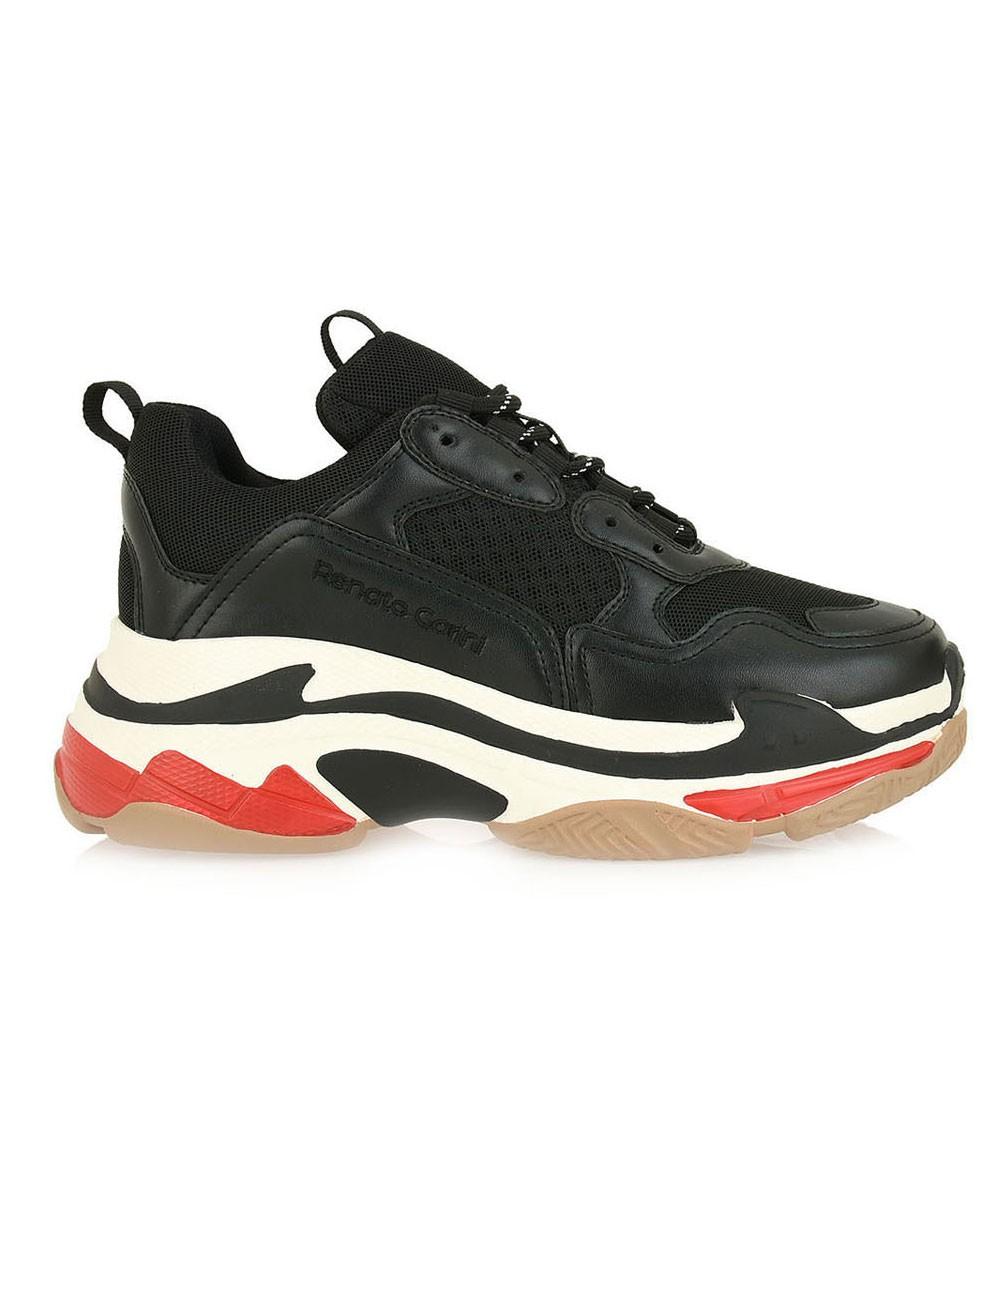 Renato Garini Γυναικεία Παπούτσια Sneakers 703-19R Μαύρο Πολύχρωμο Μπέζ N116W7033P78